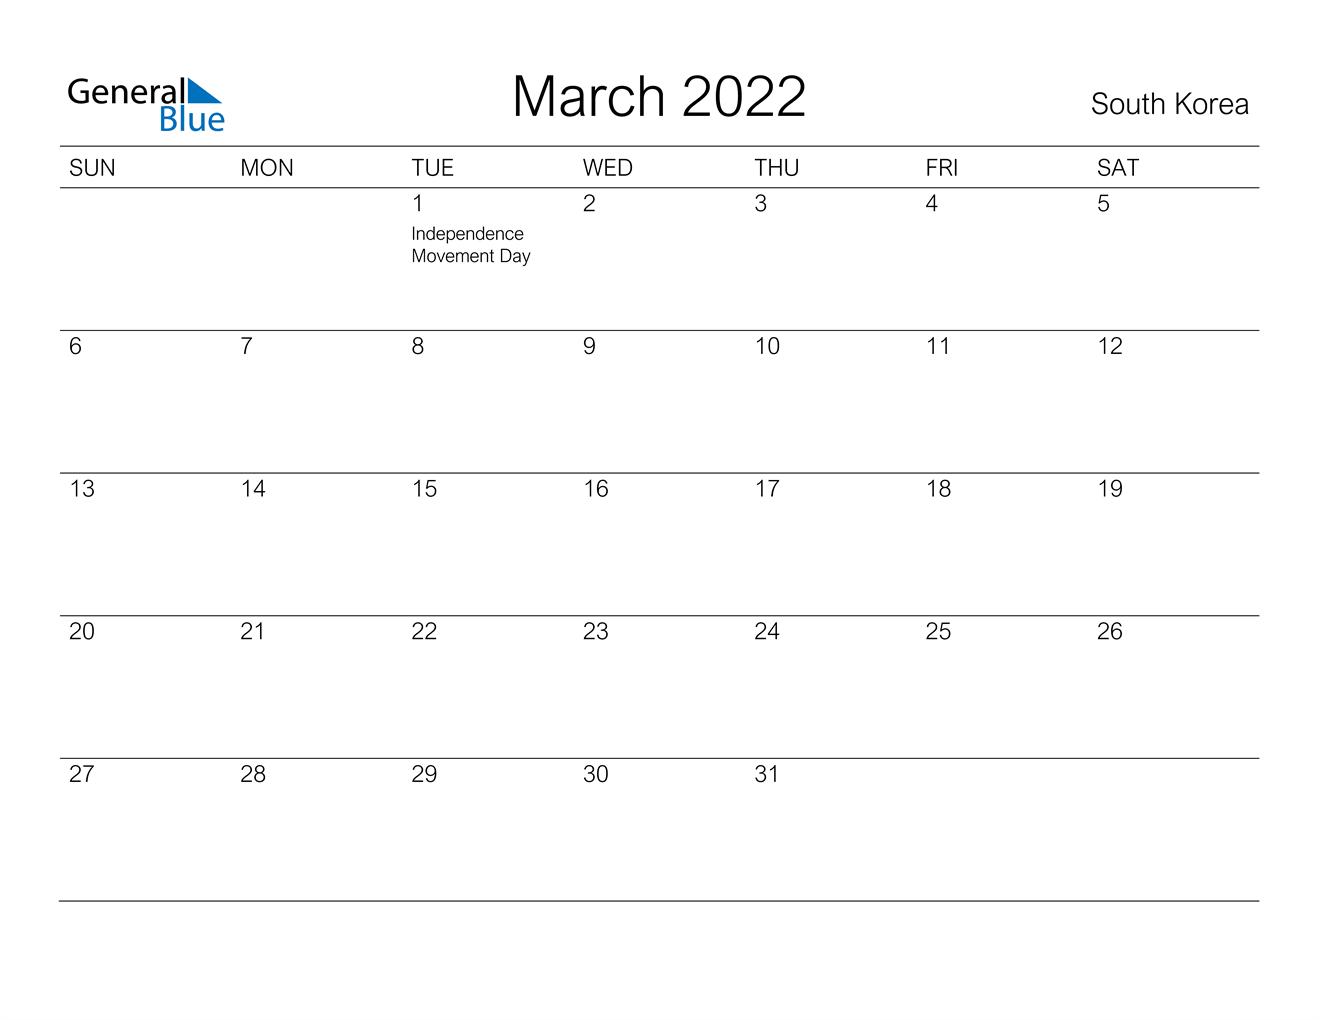 March 2022 Calendar - South Korea